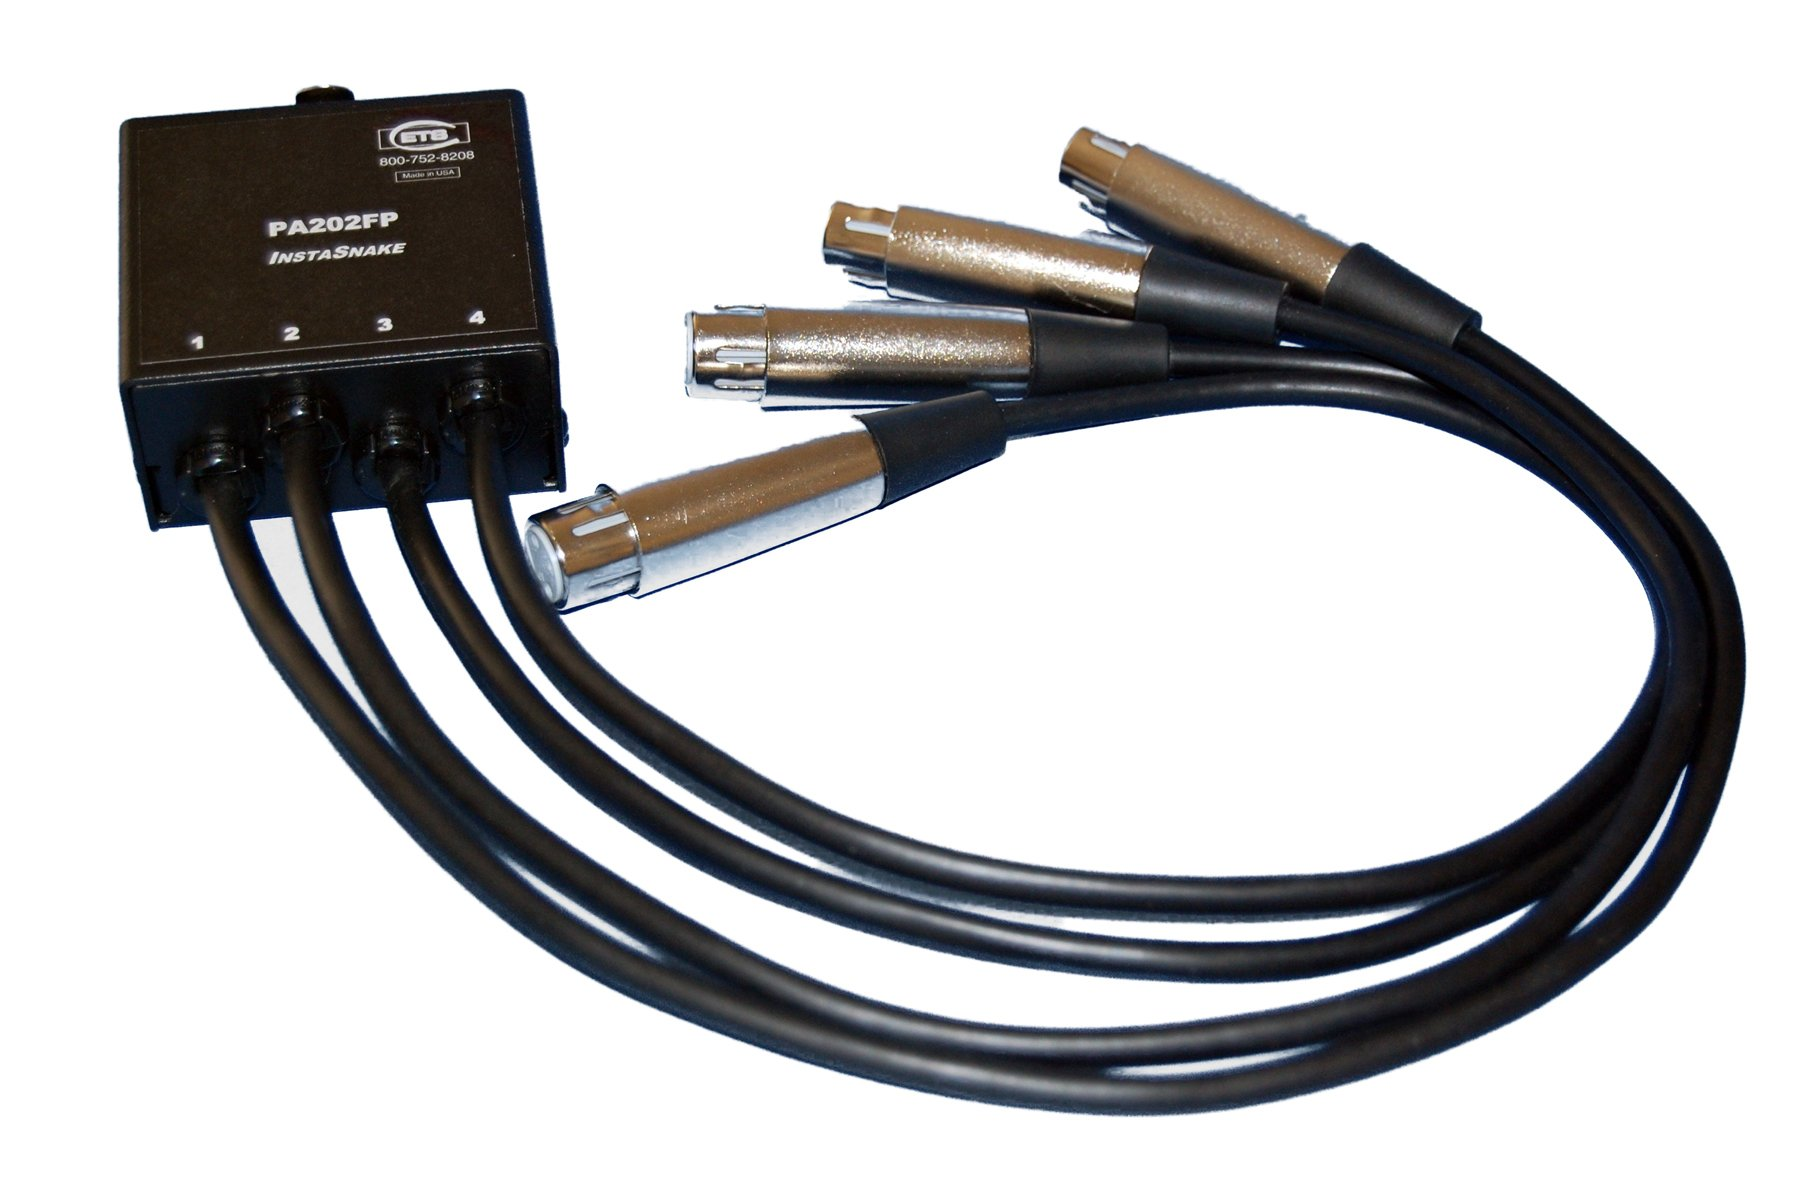 rj45 wiring for balanced phantom wiring diagrams simple